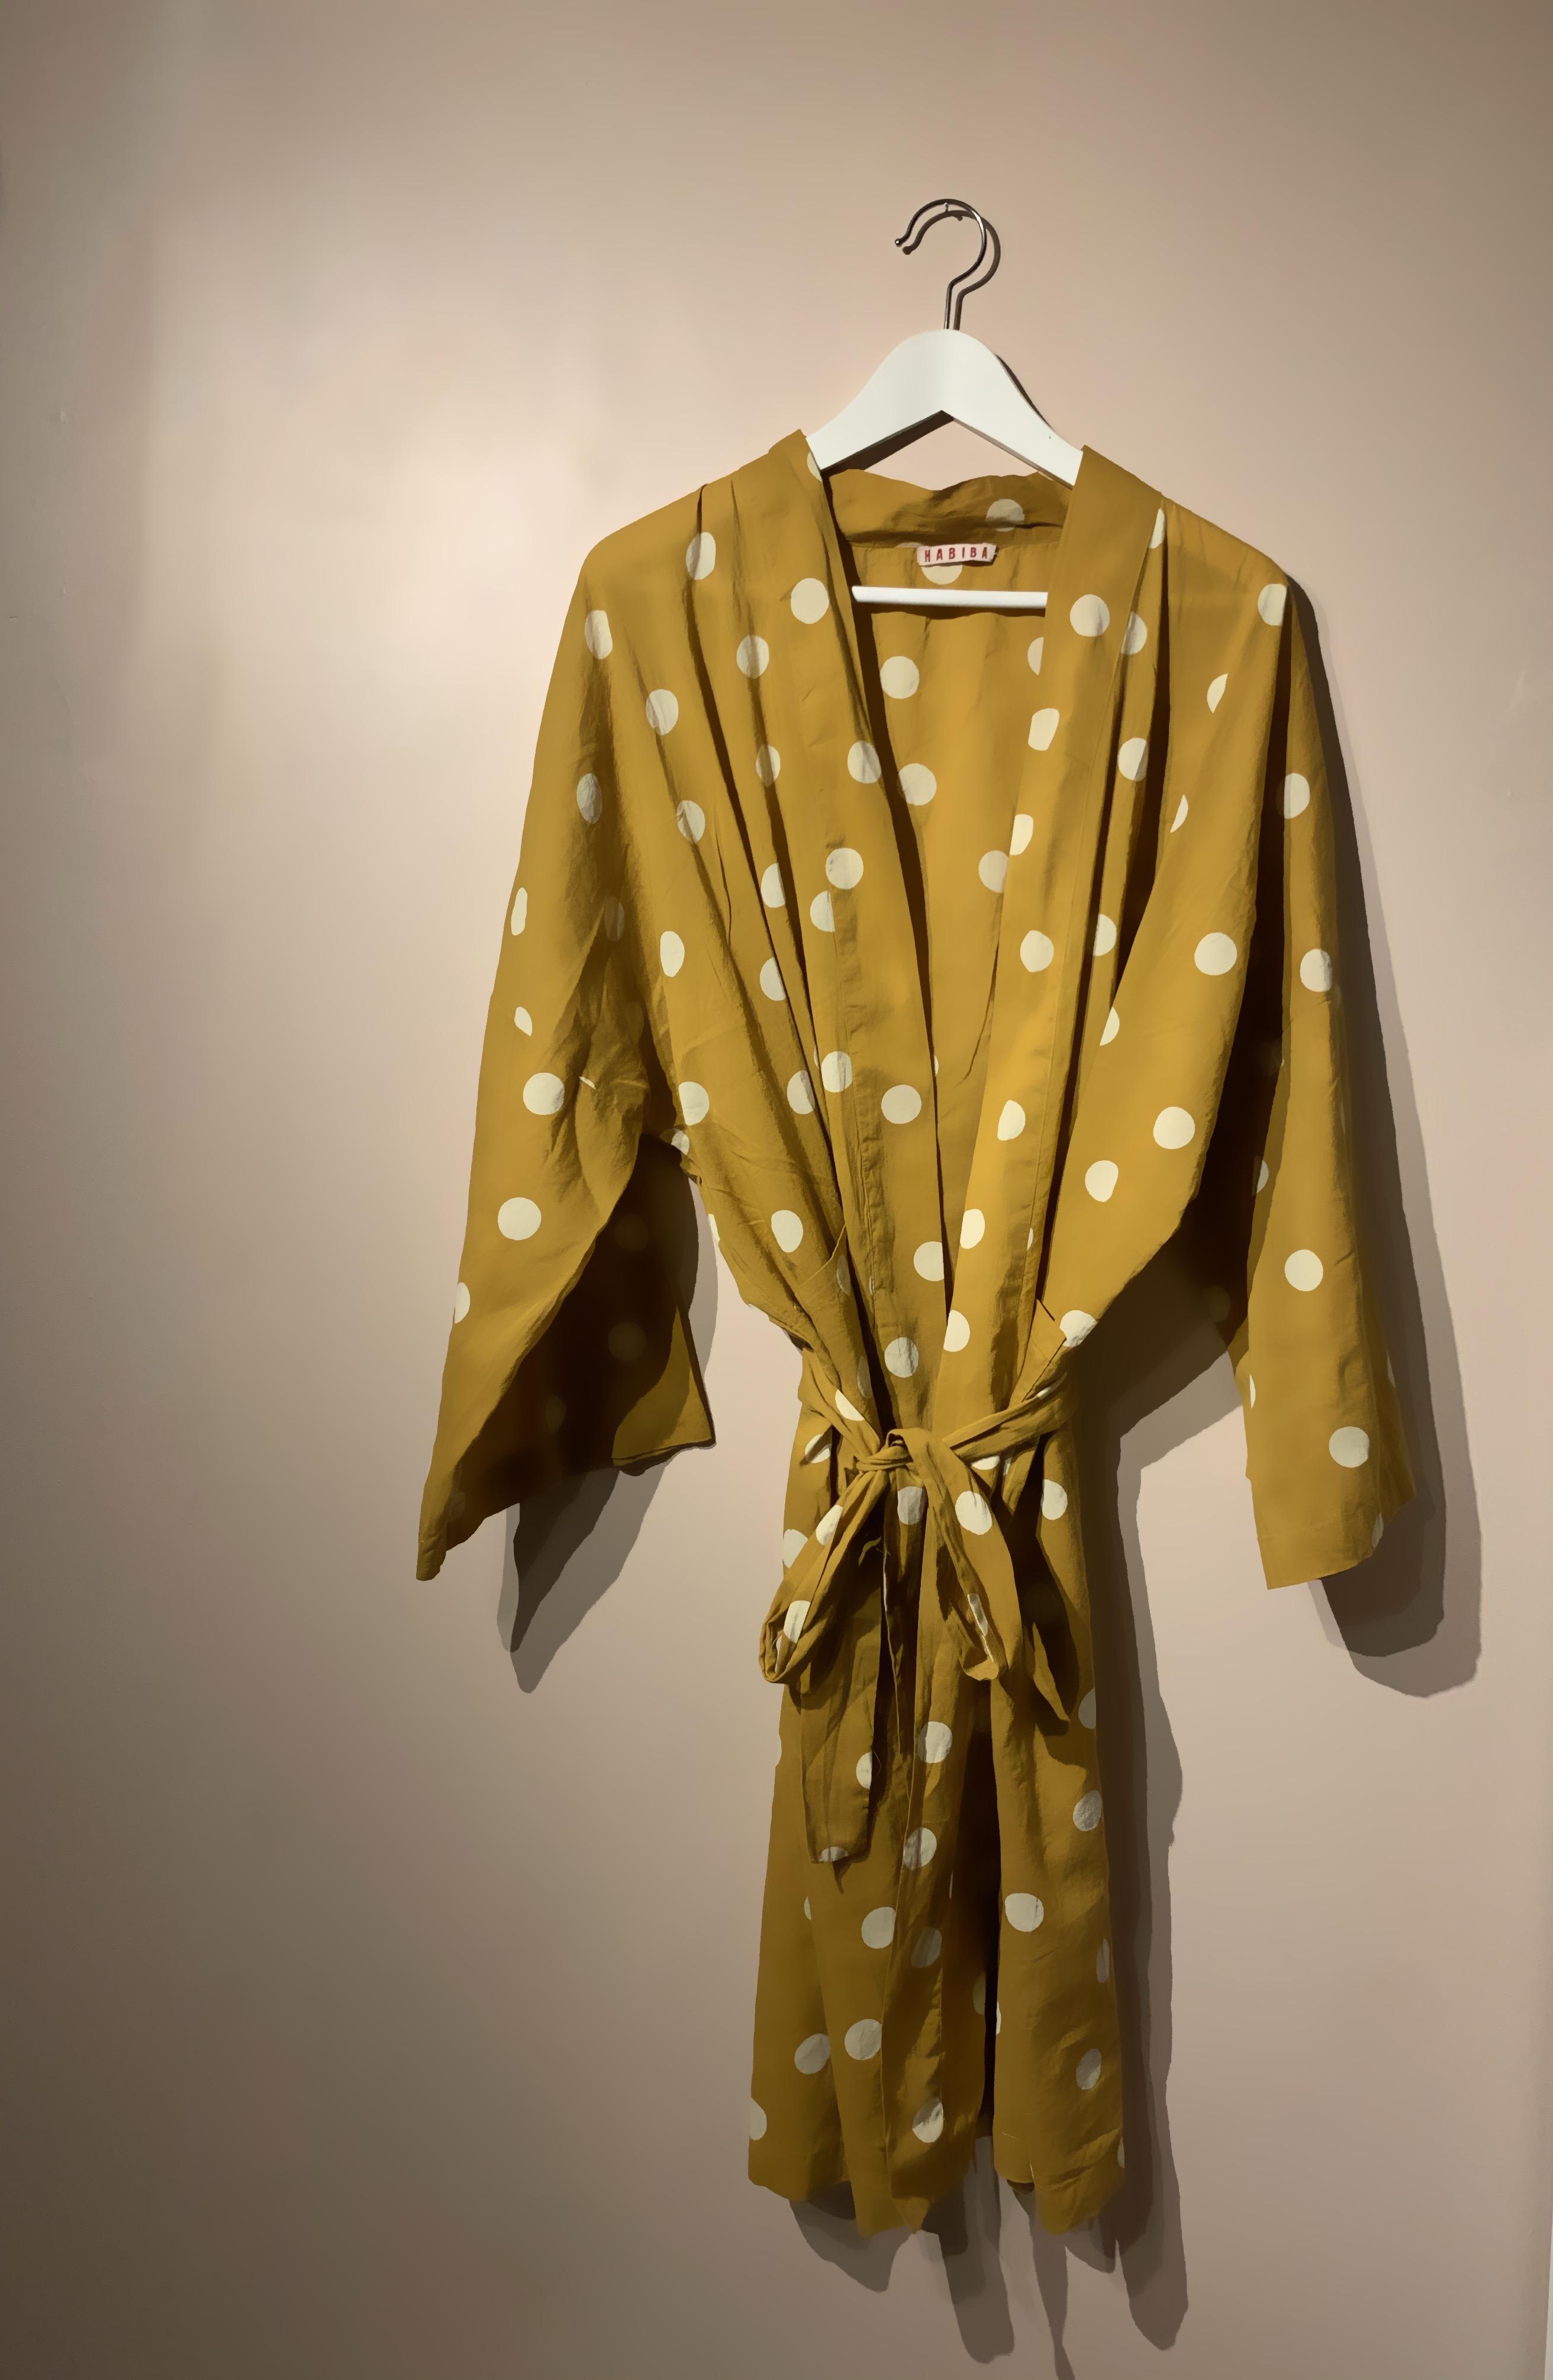 HABIBA - Yoko Kimono, Masala